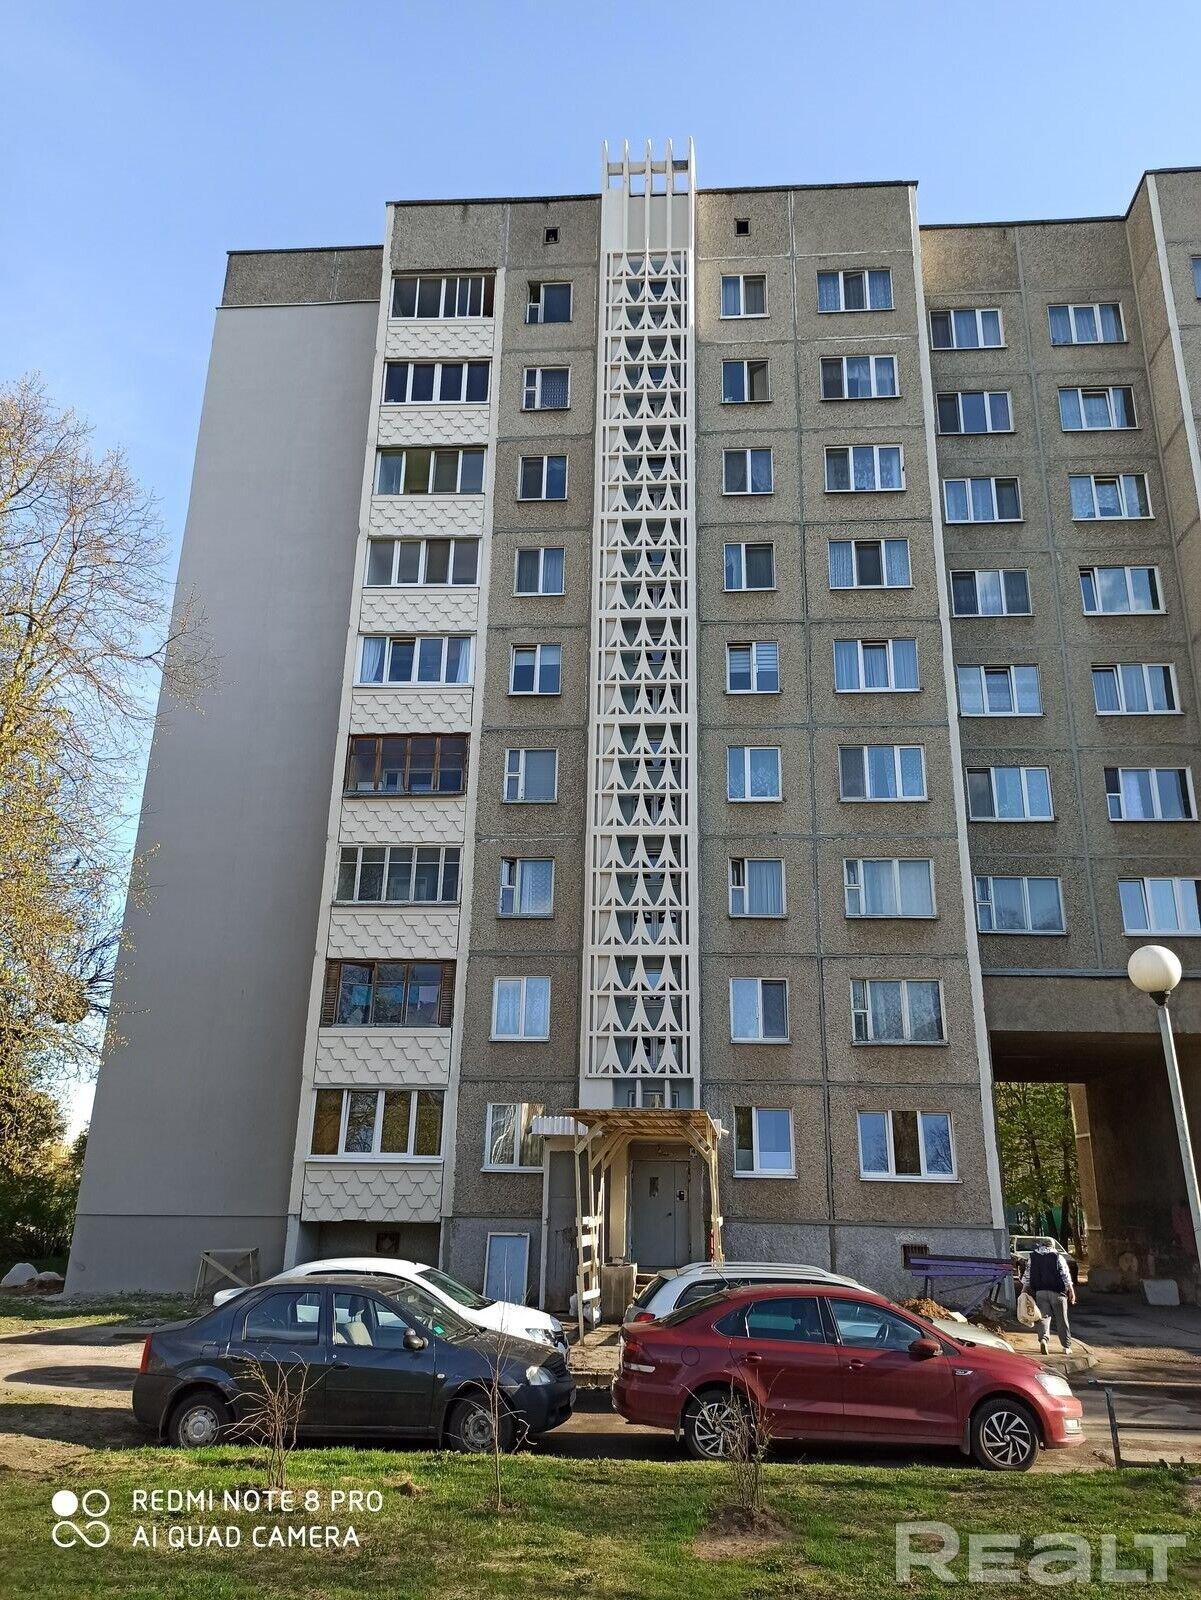 Продается комната в 2-х комнатной квартире, просп. Любимова д.12 - фото №7